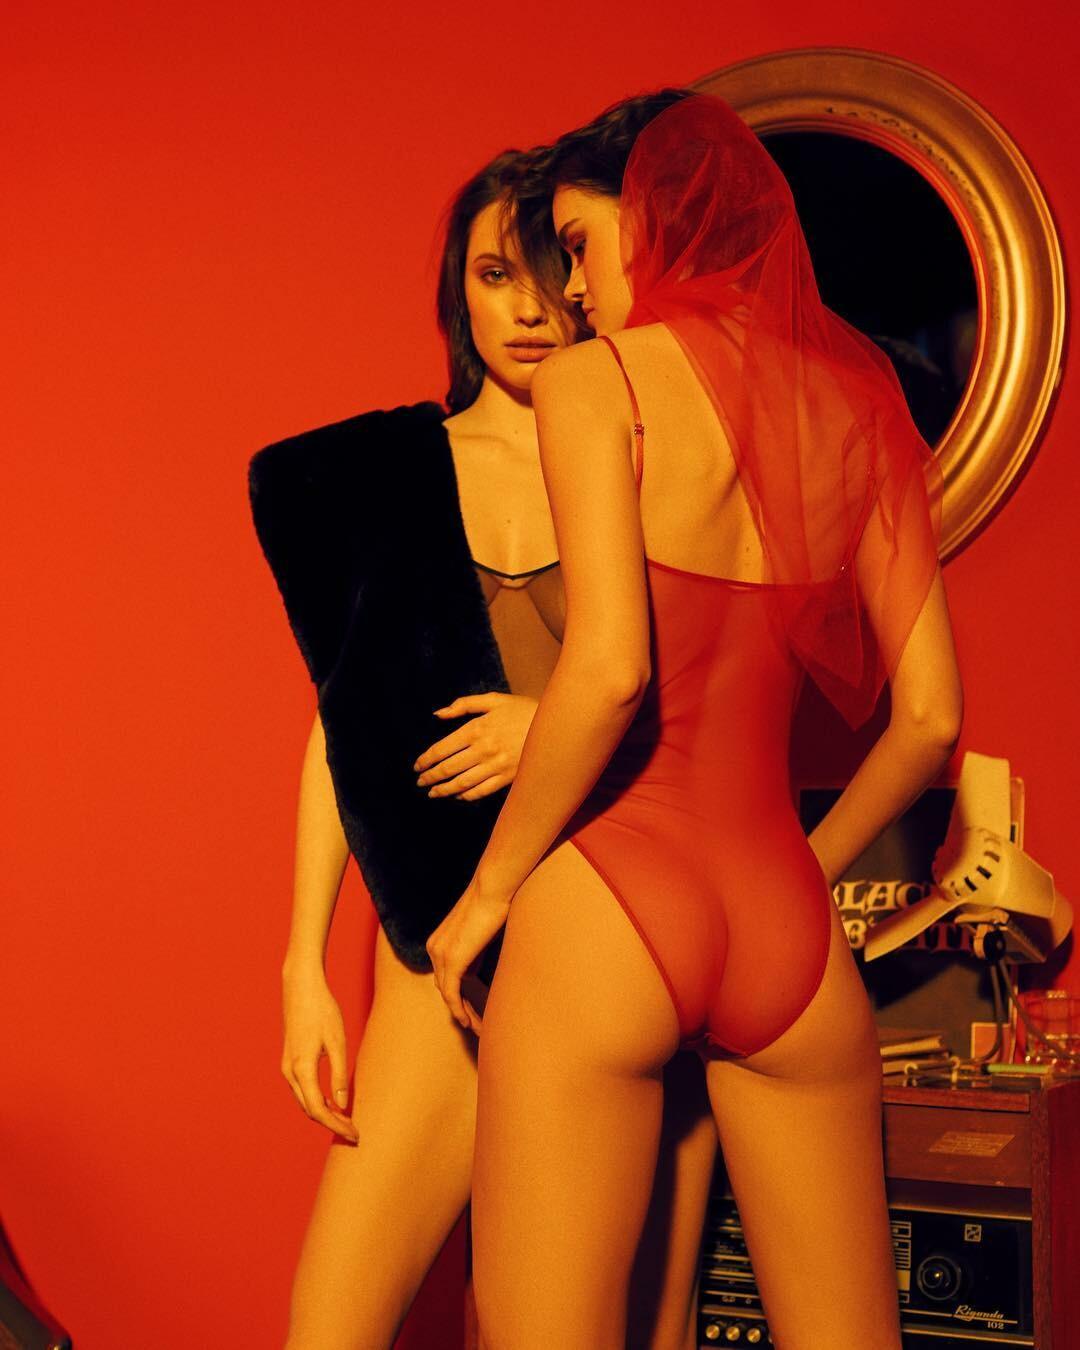 Charlotte McKinney Topless Nude Photos,VIDEO Candice Pillay Erotic fotos Lola kirke nude,Stella egitto amfar gala milano red carpet in milan italy